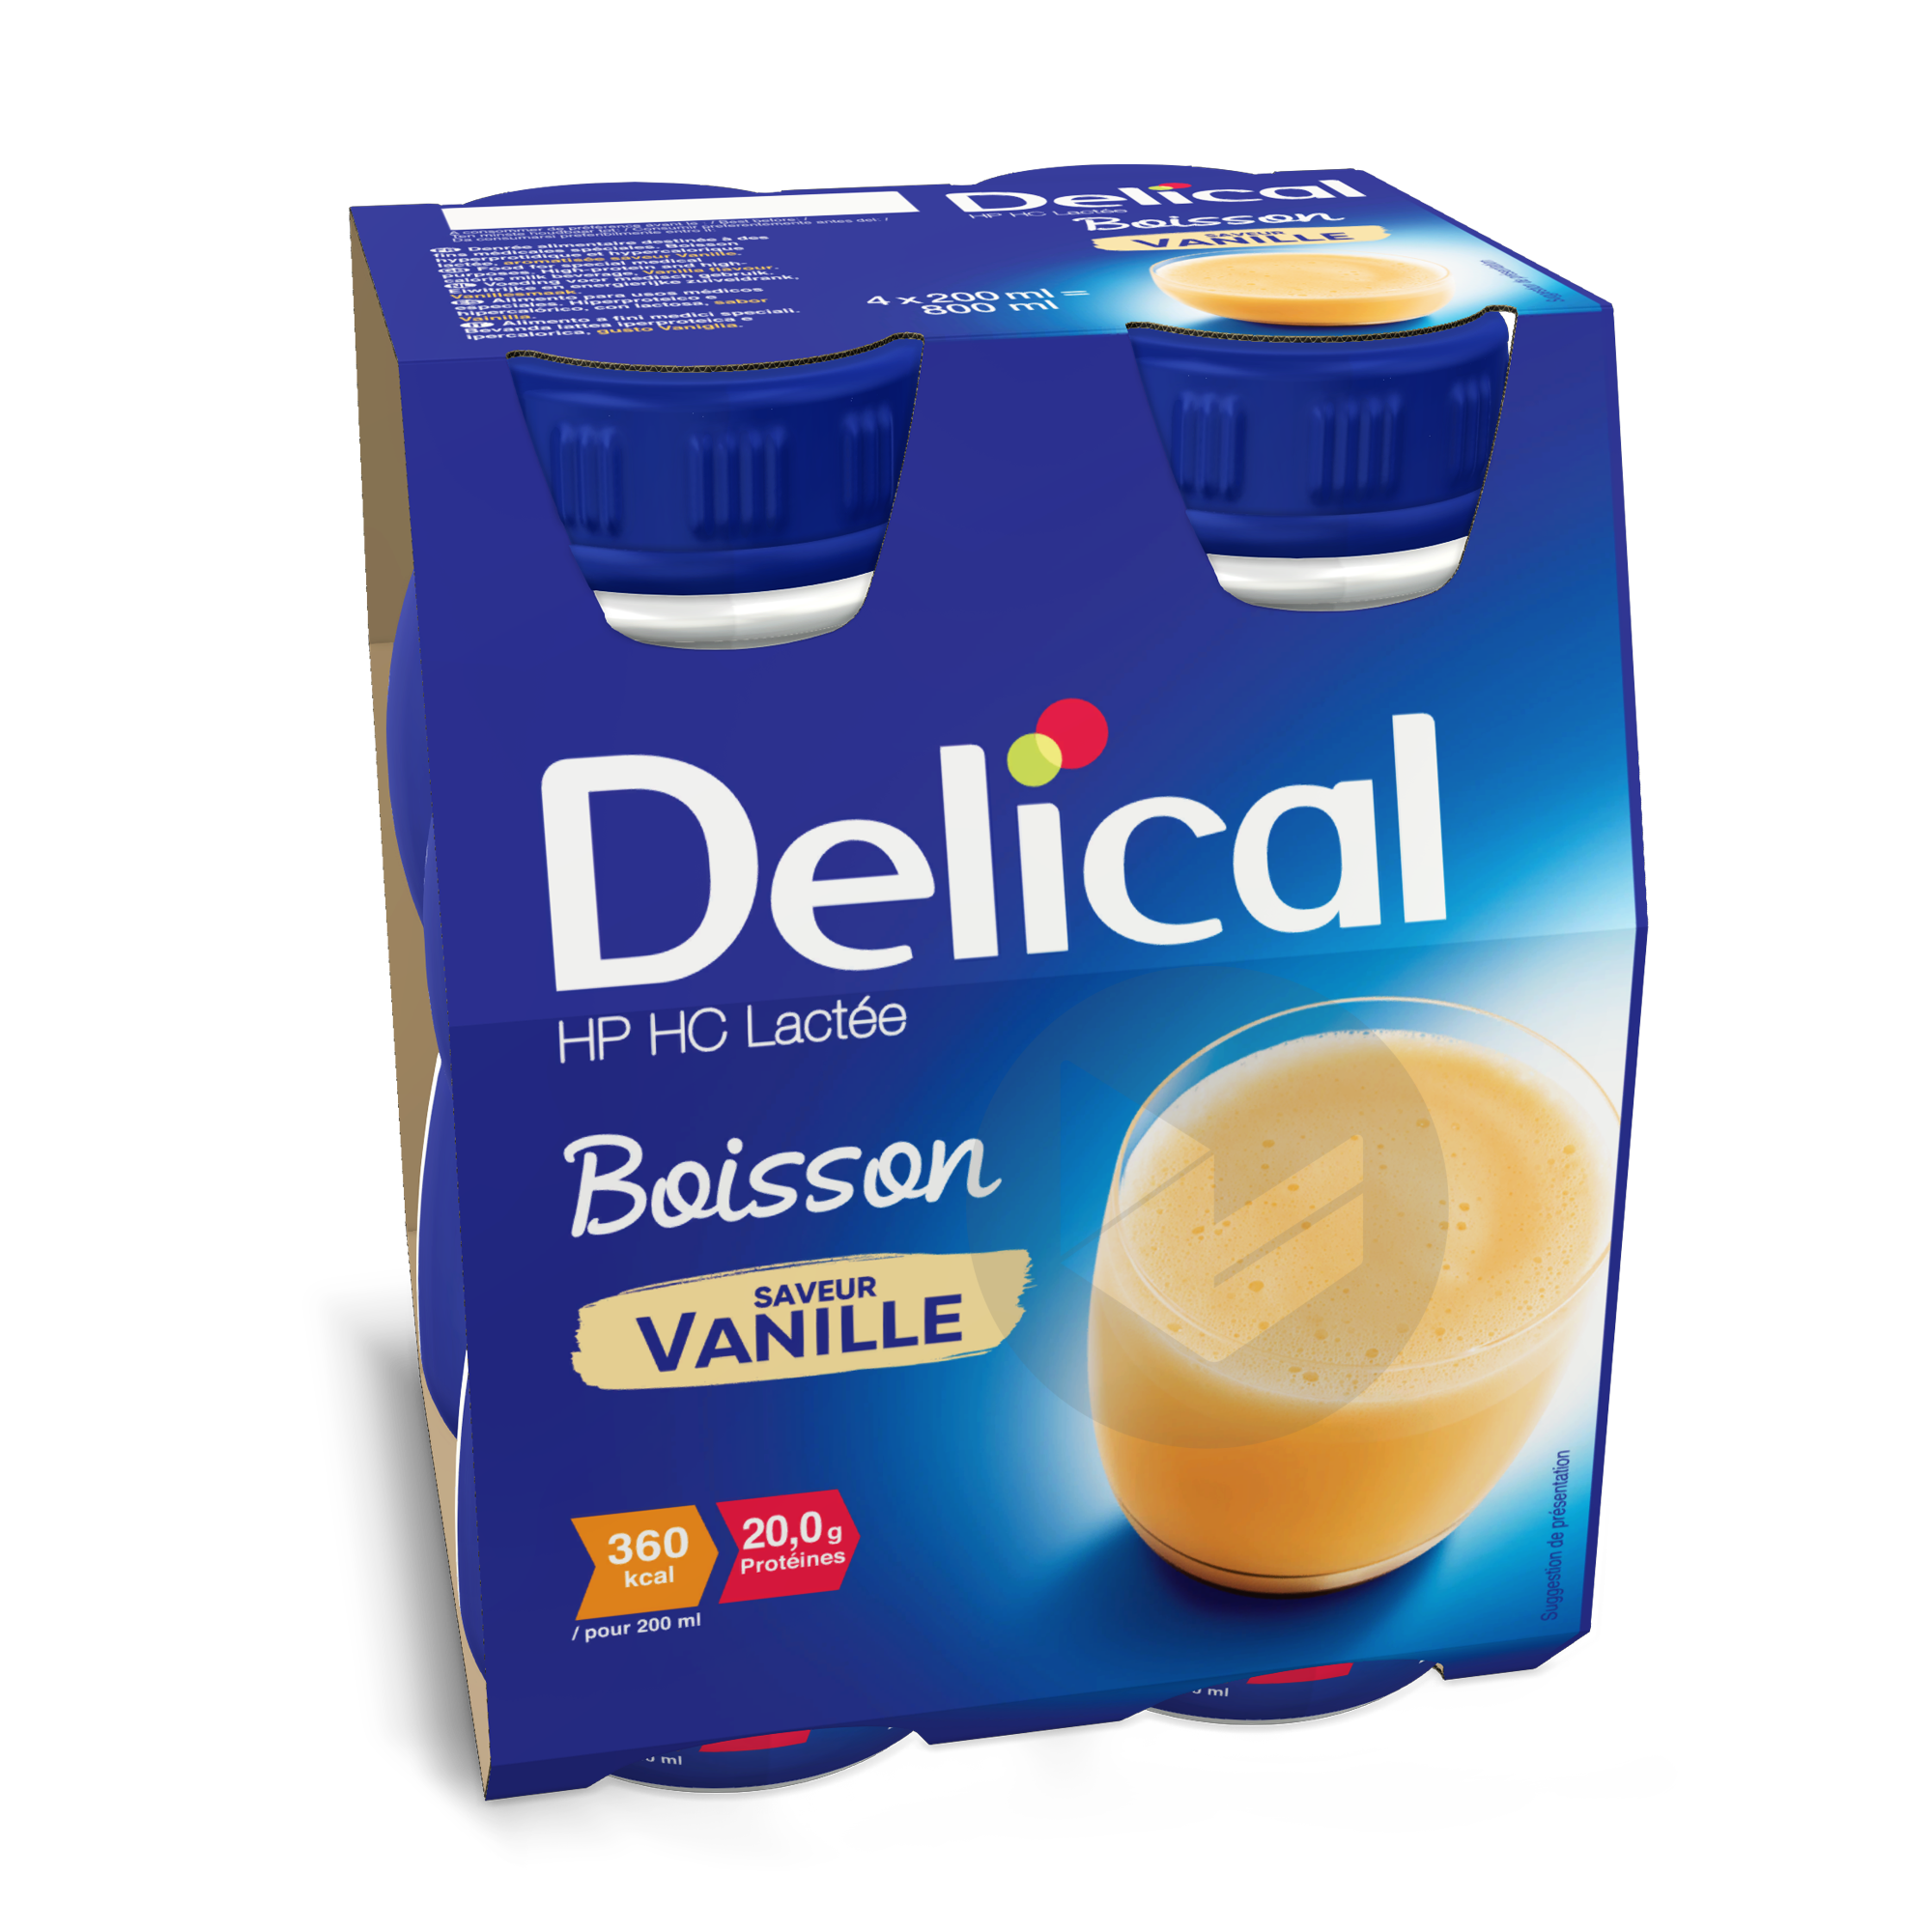 Delical Boisson Hp Hc Lactee Vanille